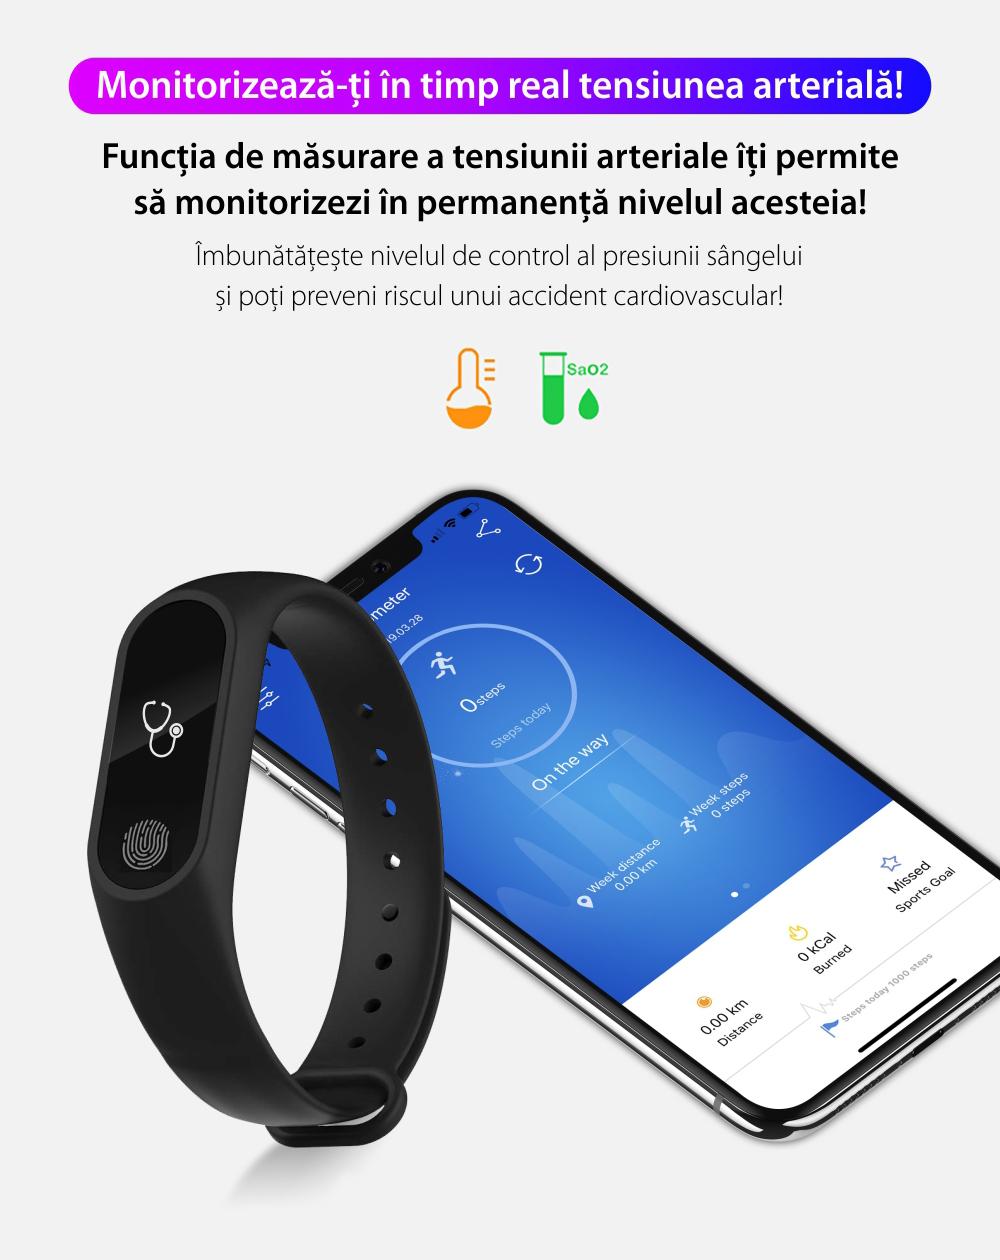 Bratara fitness inteligenta M2 cu masurarea tensiunii arteriale, Ritm cardiac, Pedometru, Bluetooth, IP67, Portocalie